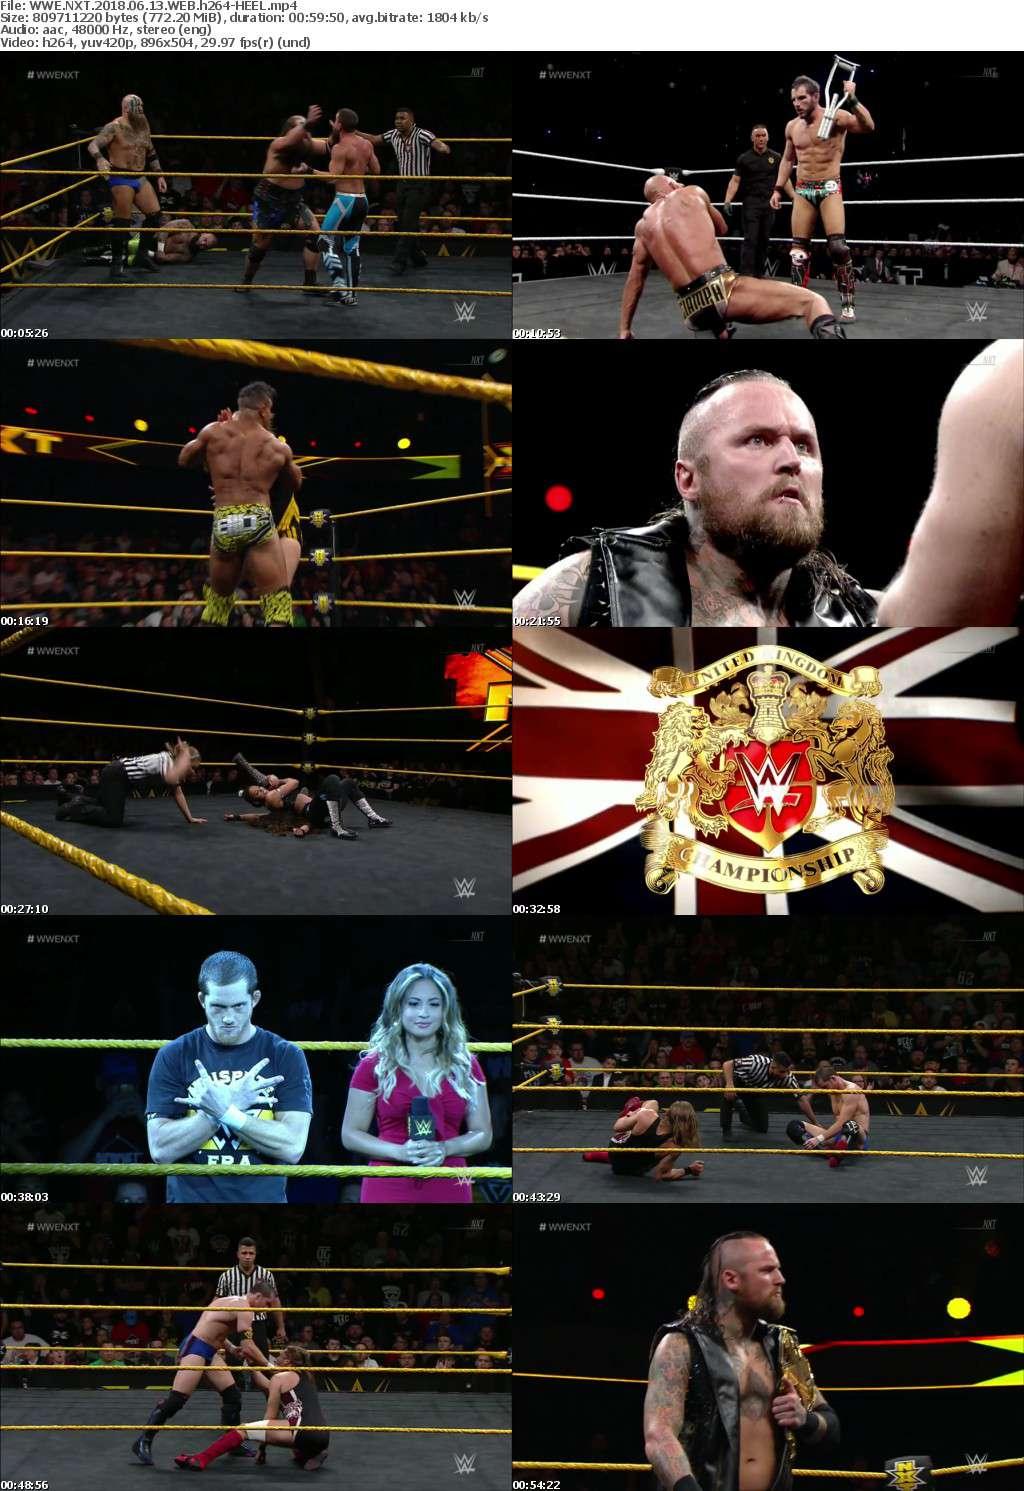 WWE NXT 2018 06 13 WEB h264-HEEL